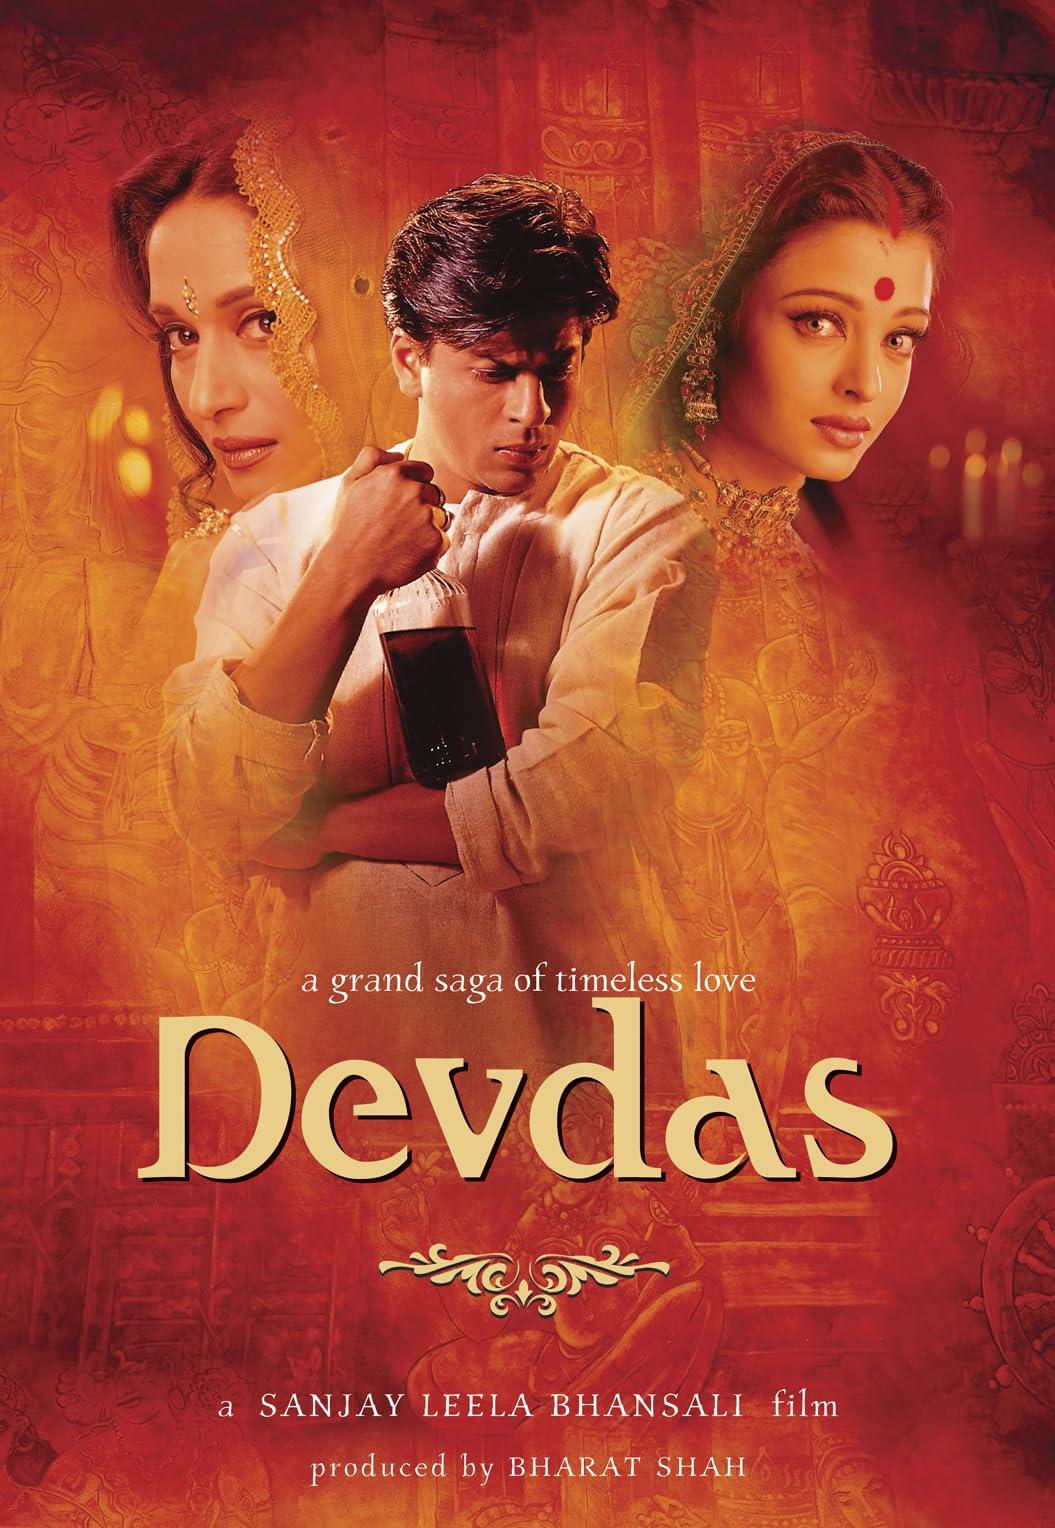 Devdas (2002) Hindi 1080p | 720p | 480p Full Movie Watch Online Download